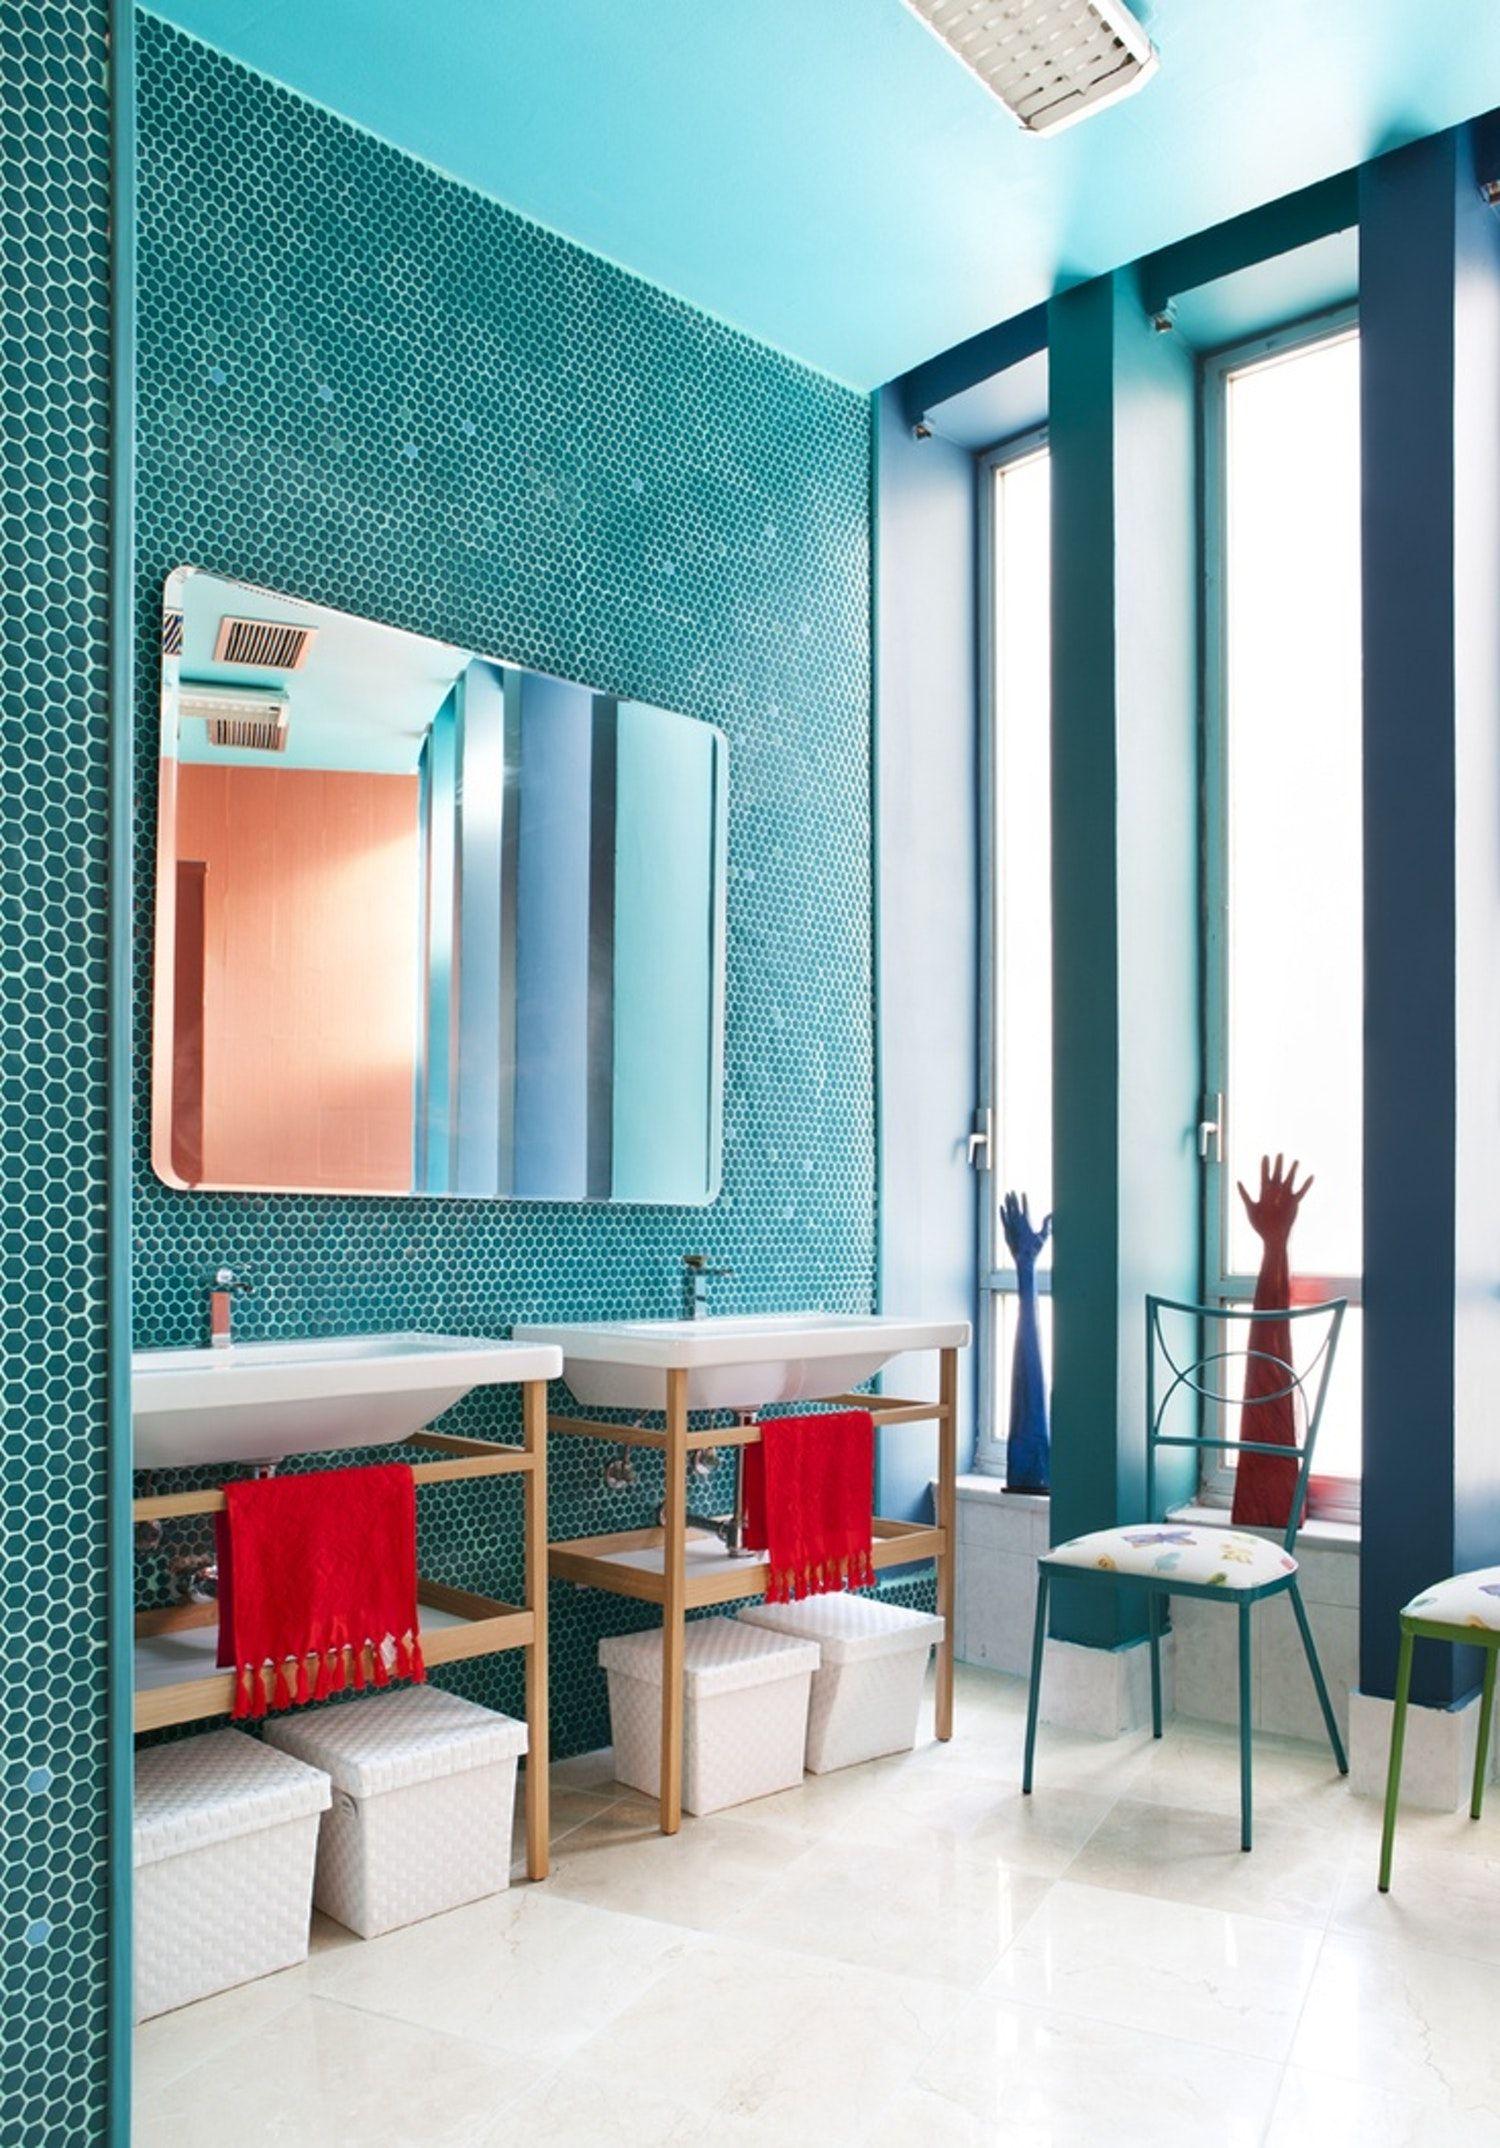 Paint Color Portfolio: Turquoise Bathrooms   Turquoise ...